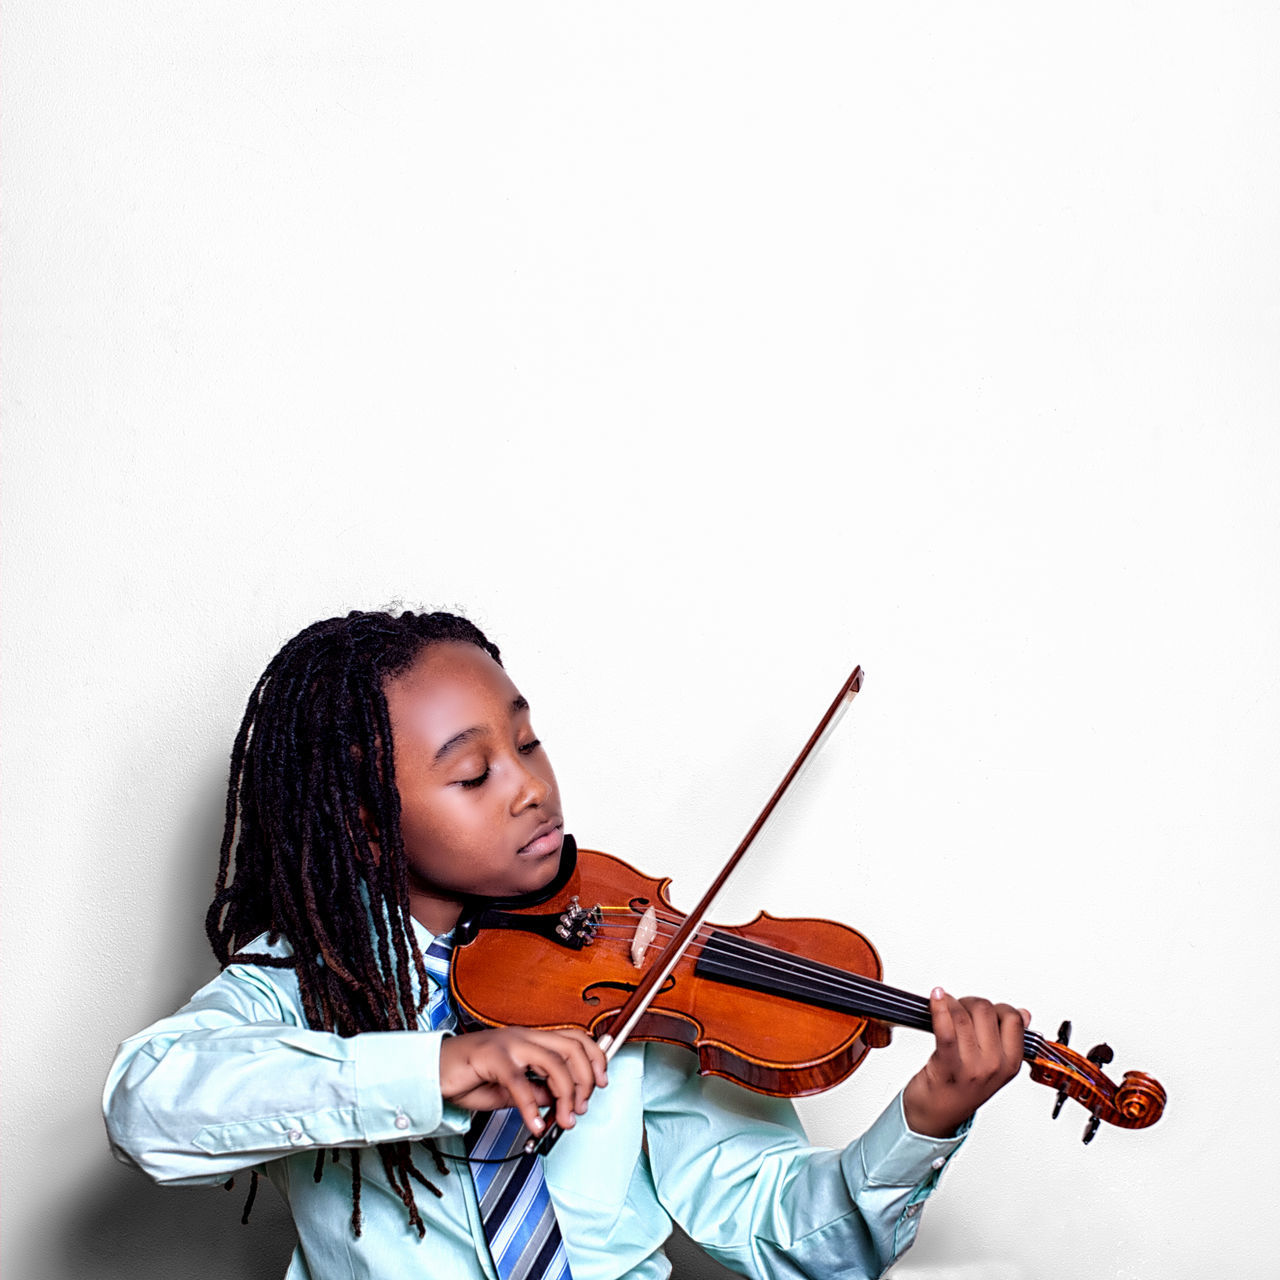 My son and his violin Violin Music Child